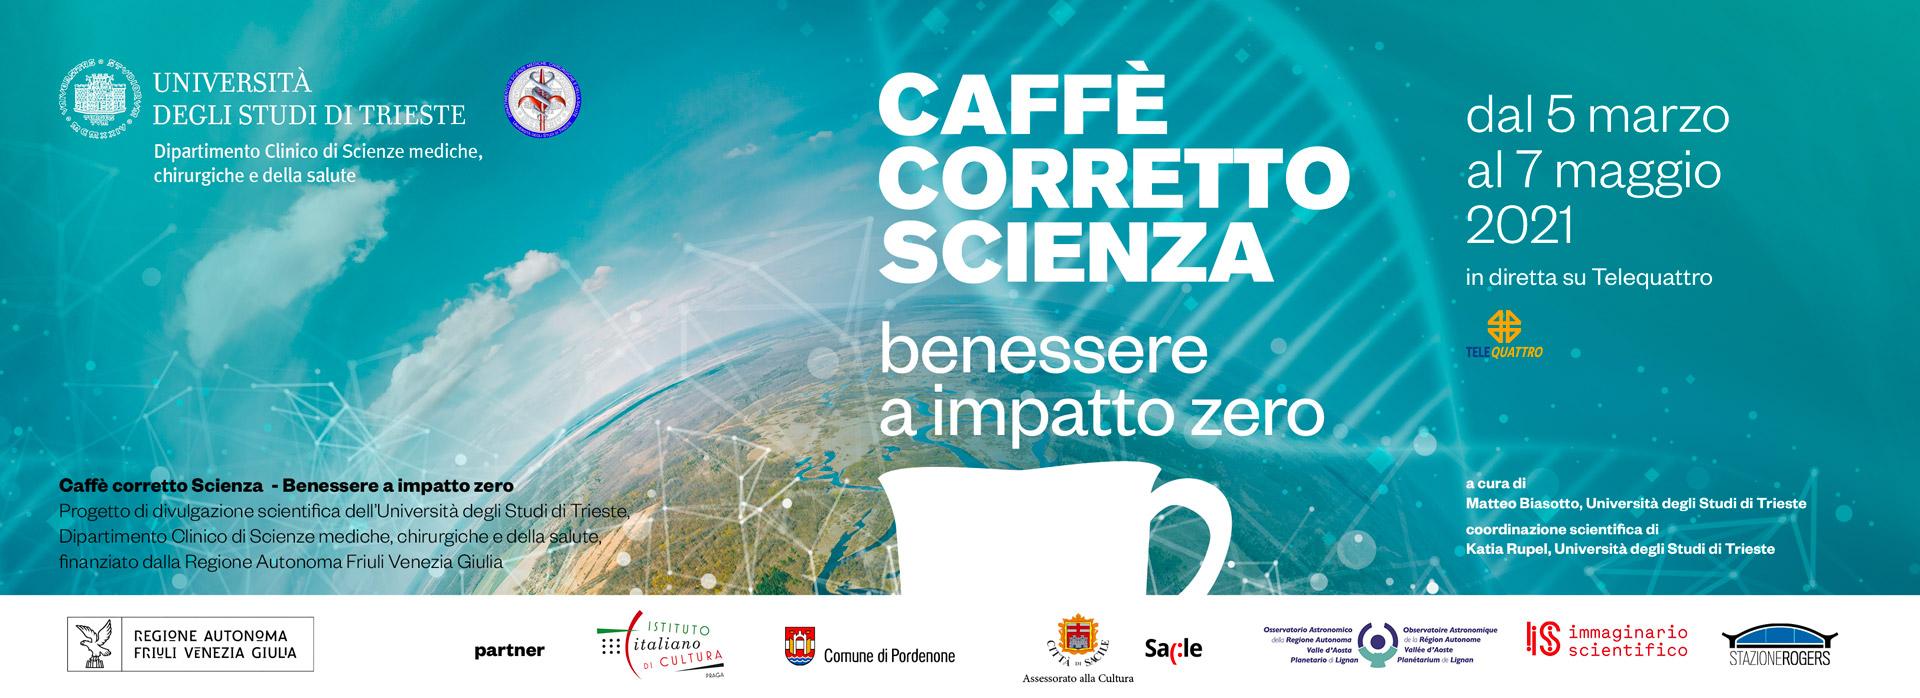 caffe-scienza-2021.jpg